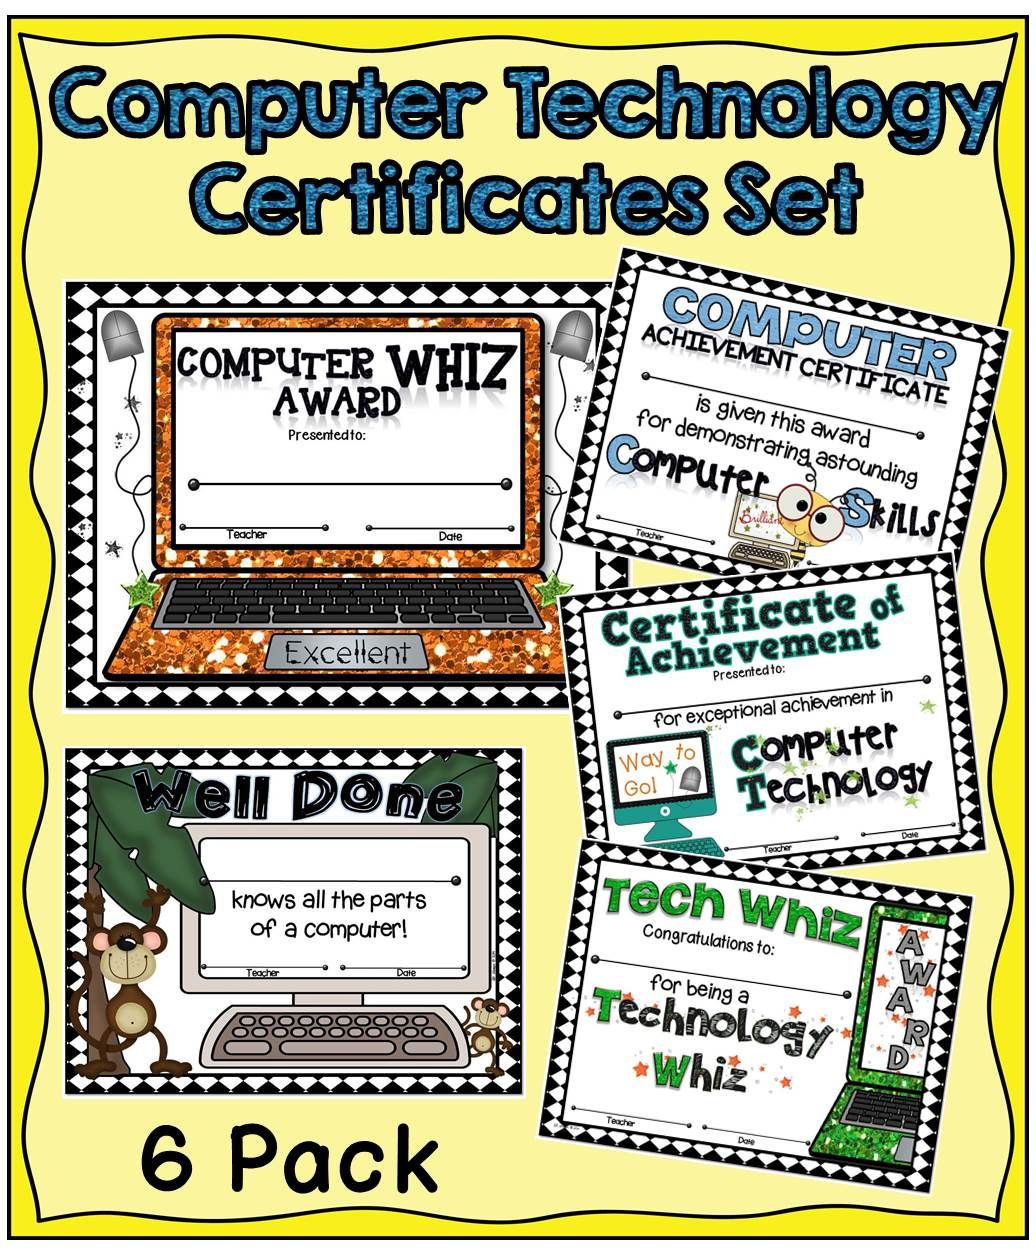 Computer Technology Certificates Set